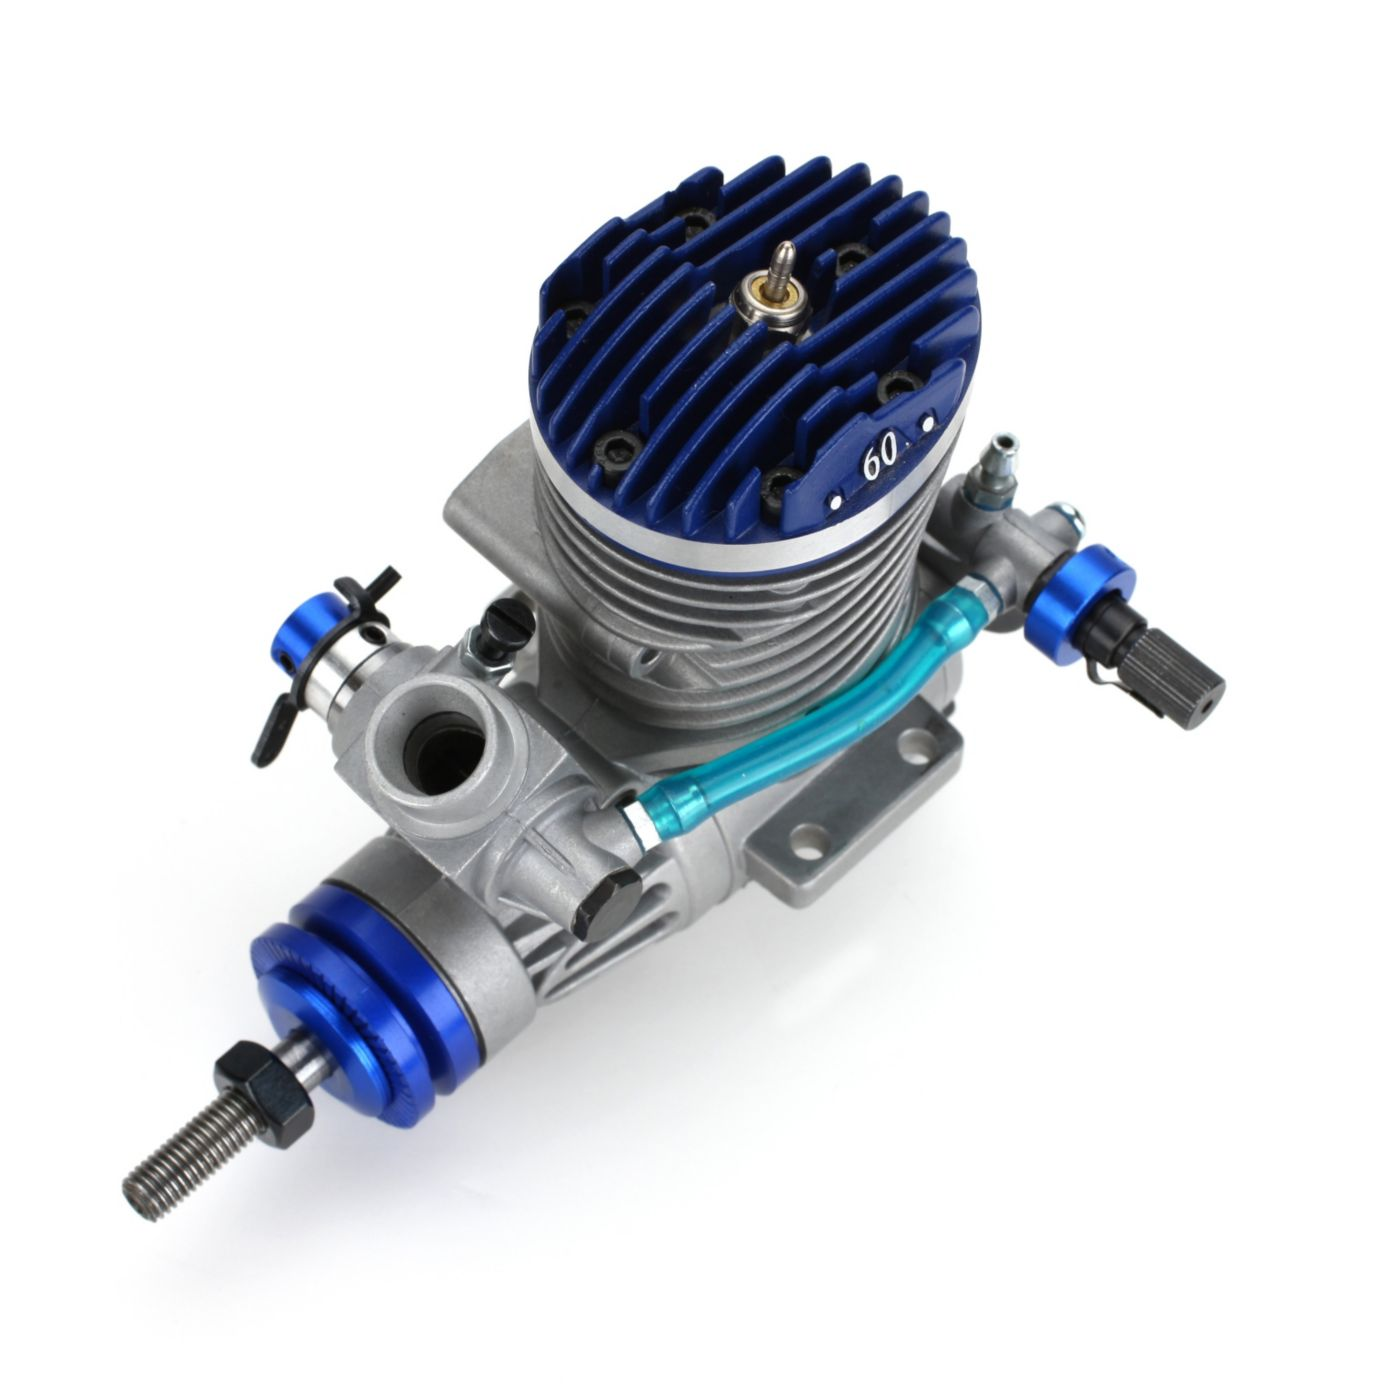 40NX EVO040829F 60NX Evolution Engines High Speed Needle Valve